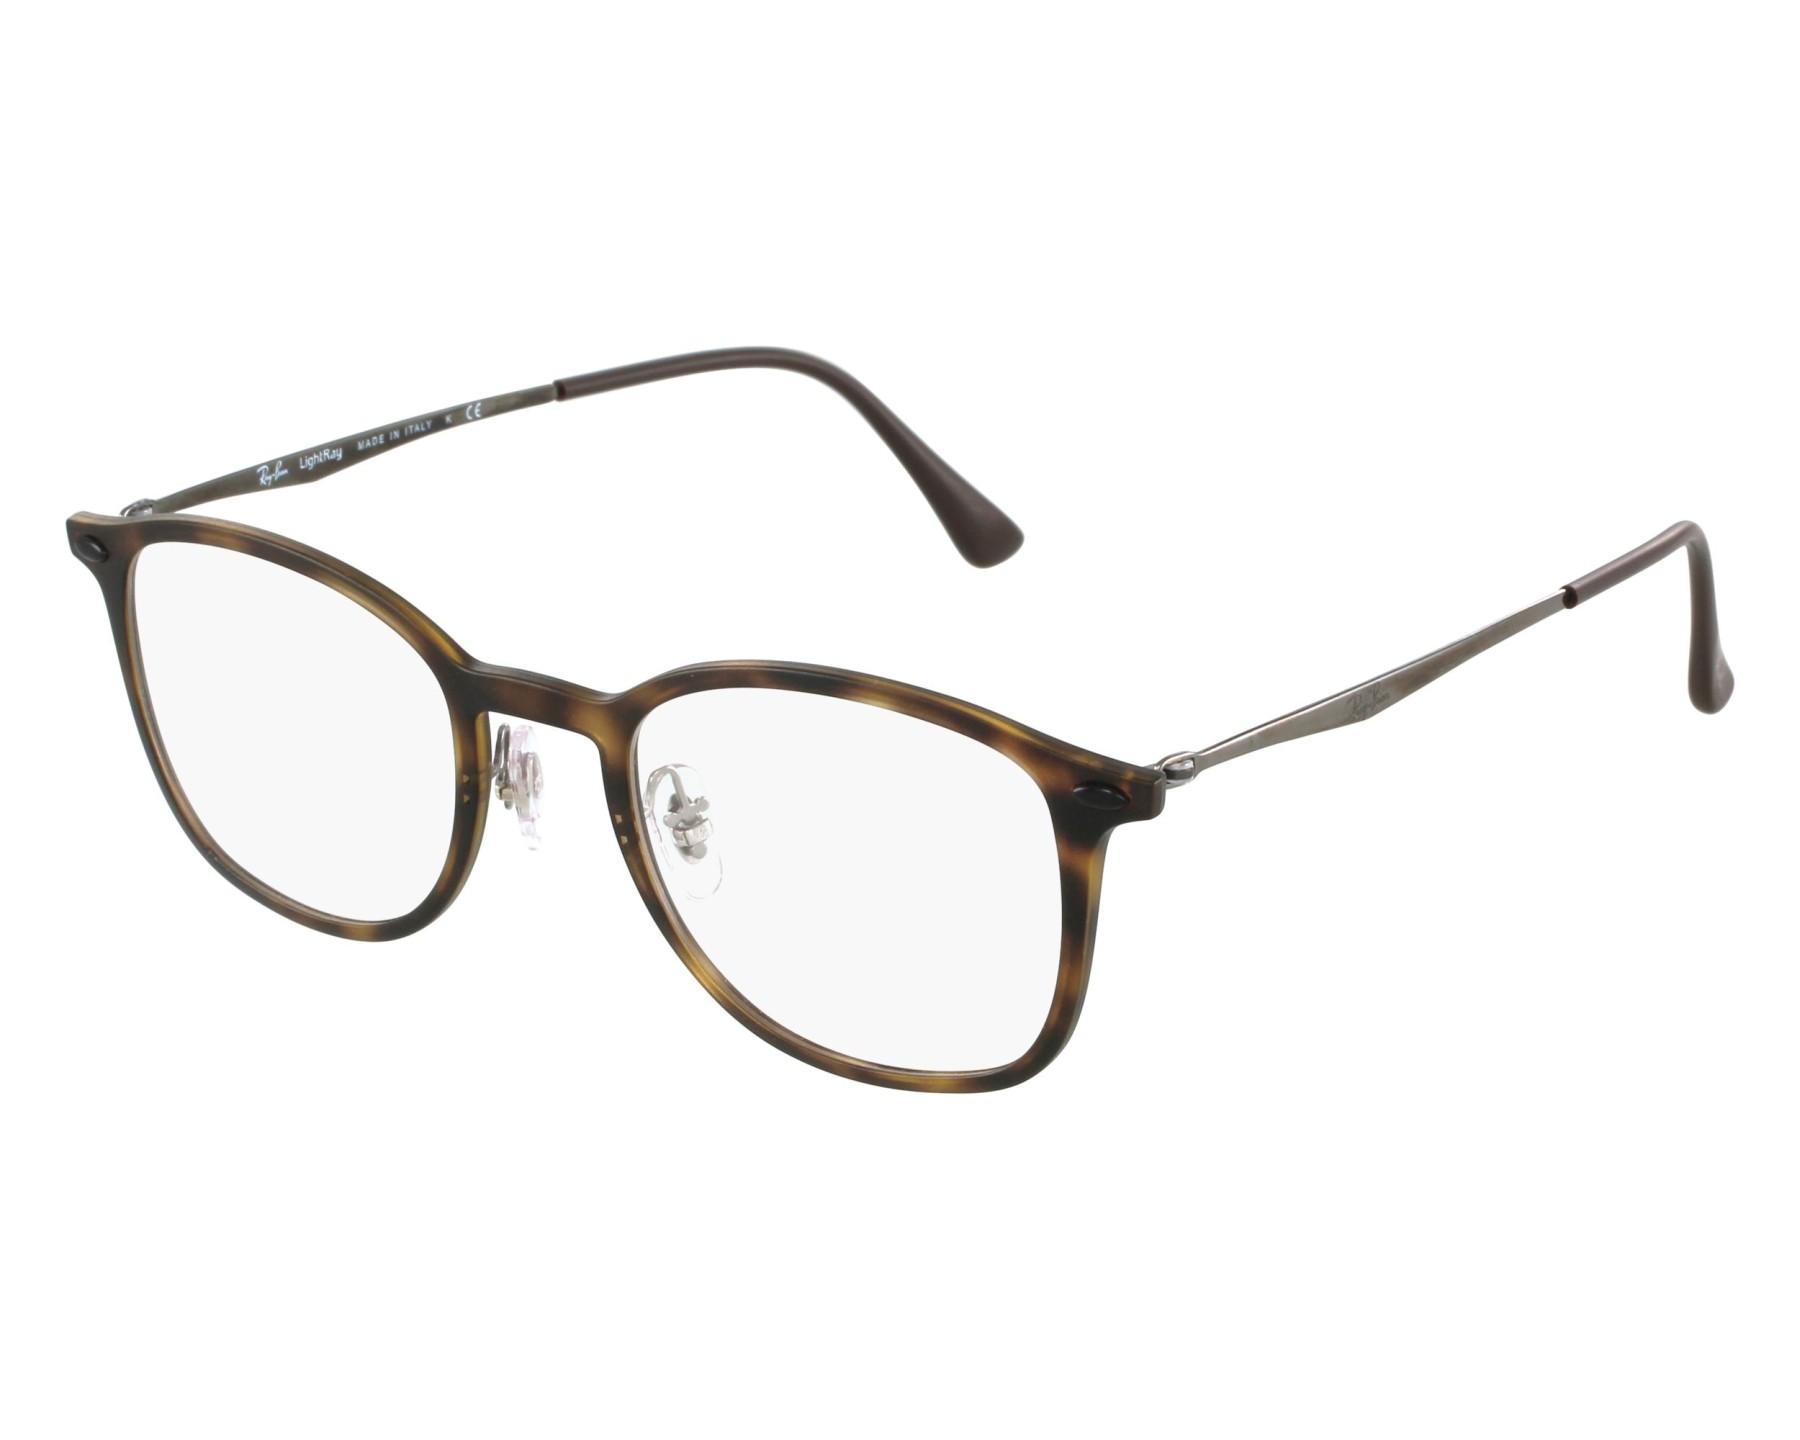 3267d179f6ae2 eyeglasses Ray-Ban RX-7051 5200 47-20 Havana Gun front view